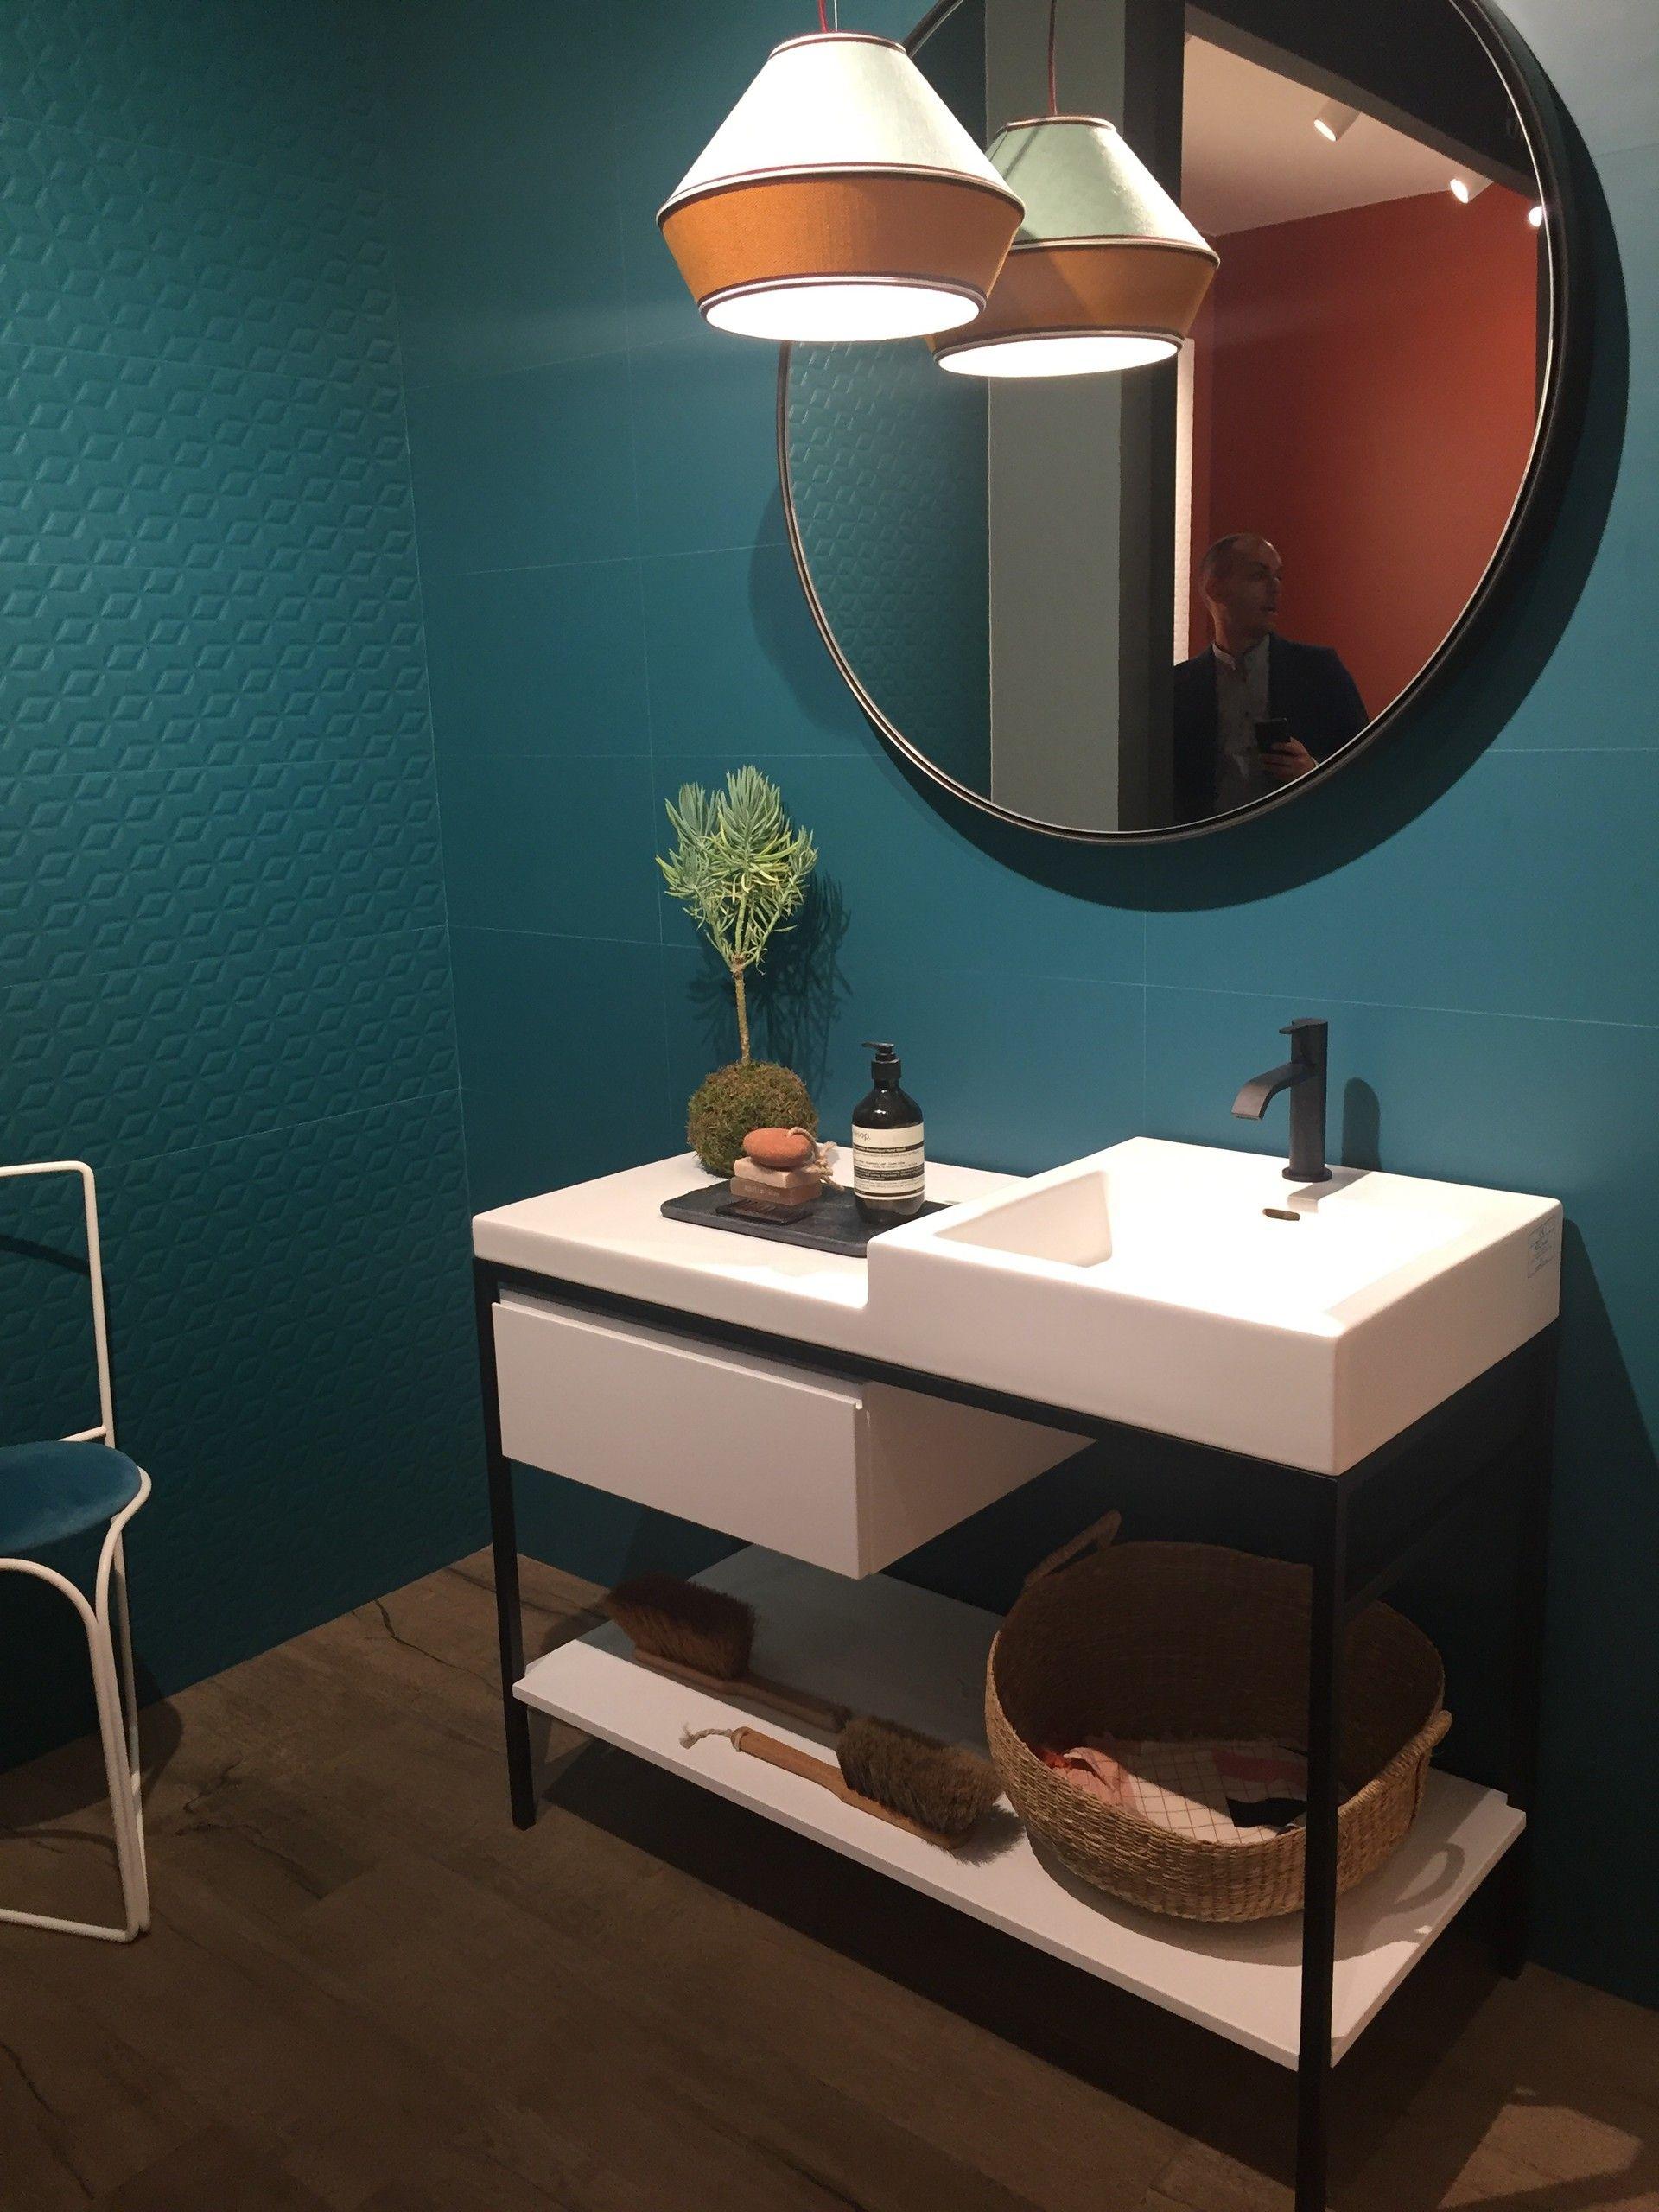 50+ Salle de bain bleu et beige ideas